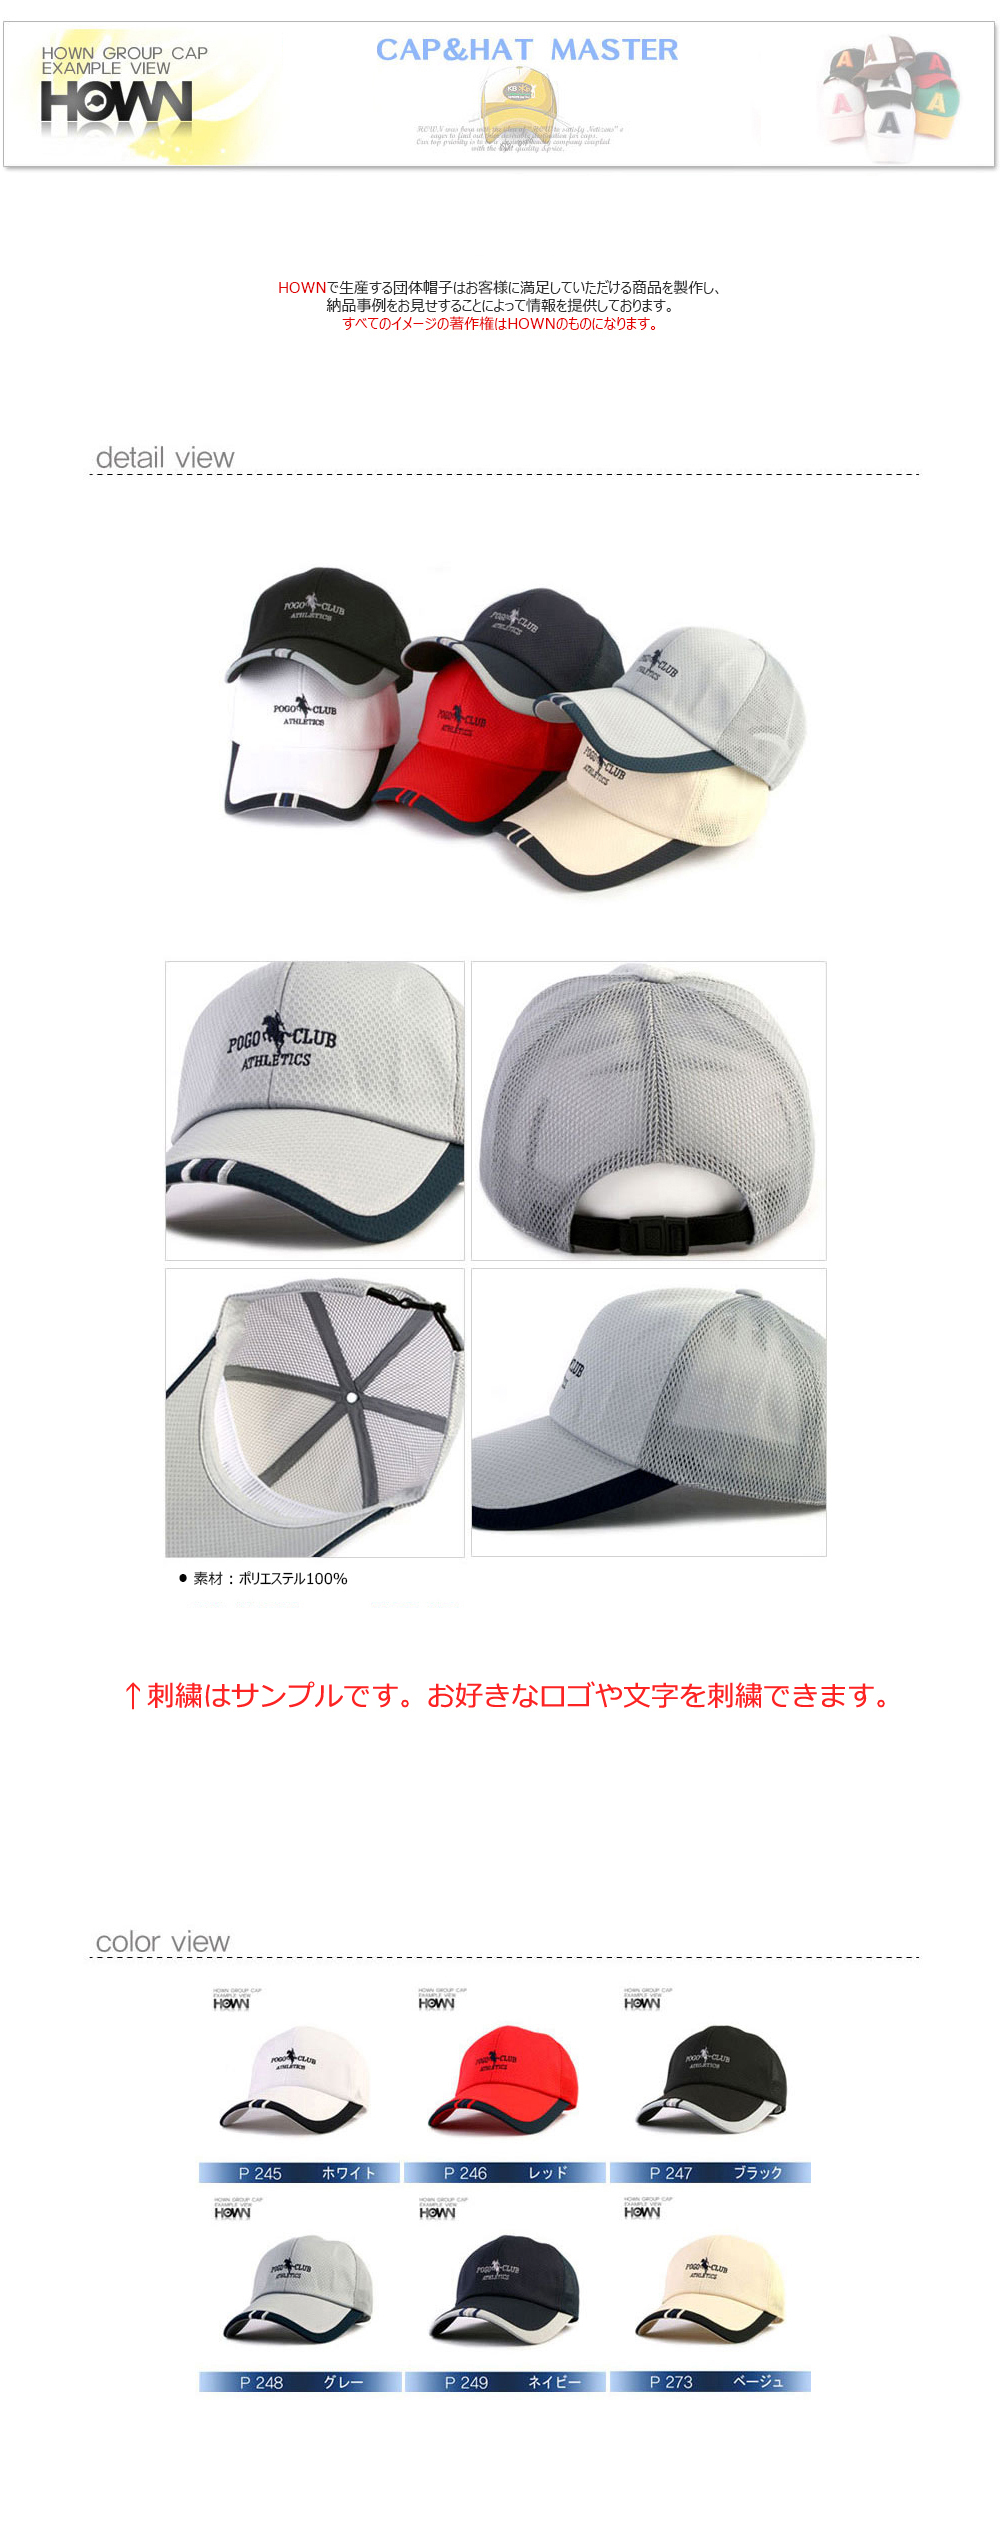 P245 P246 P247 P248 P249 P273 ゴルフ帽子 1点から製作可能!名前入れ 刺繍 プリント オリジナルキャップ イベント用 野球帽 学校行事 サークル ゴルフキャップに刺繍を!